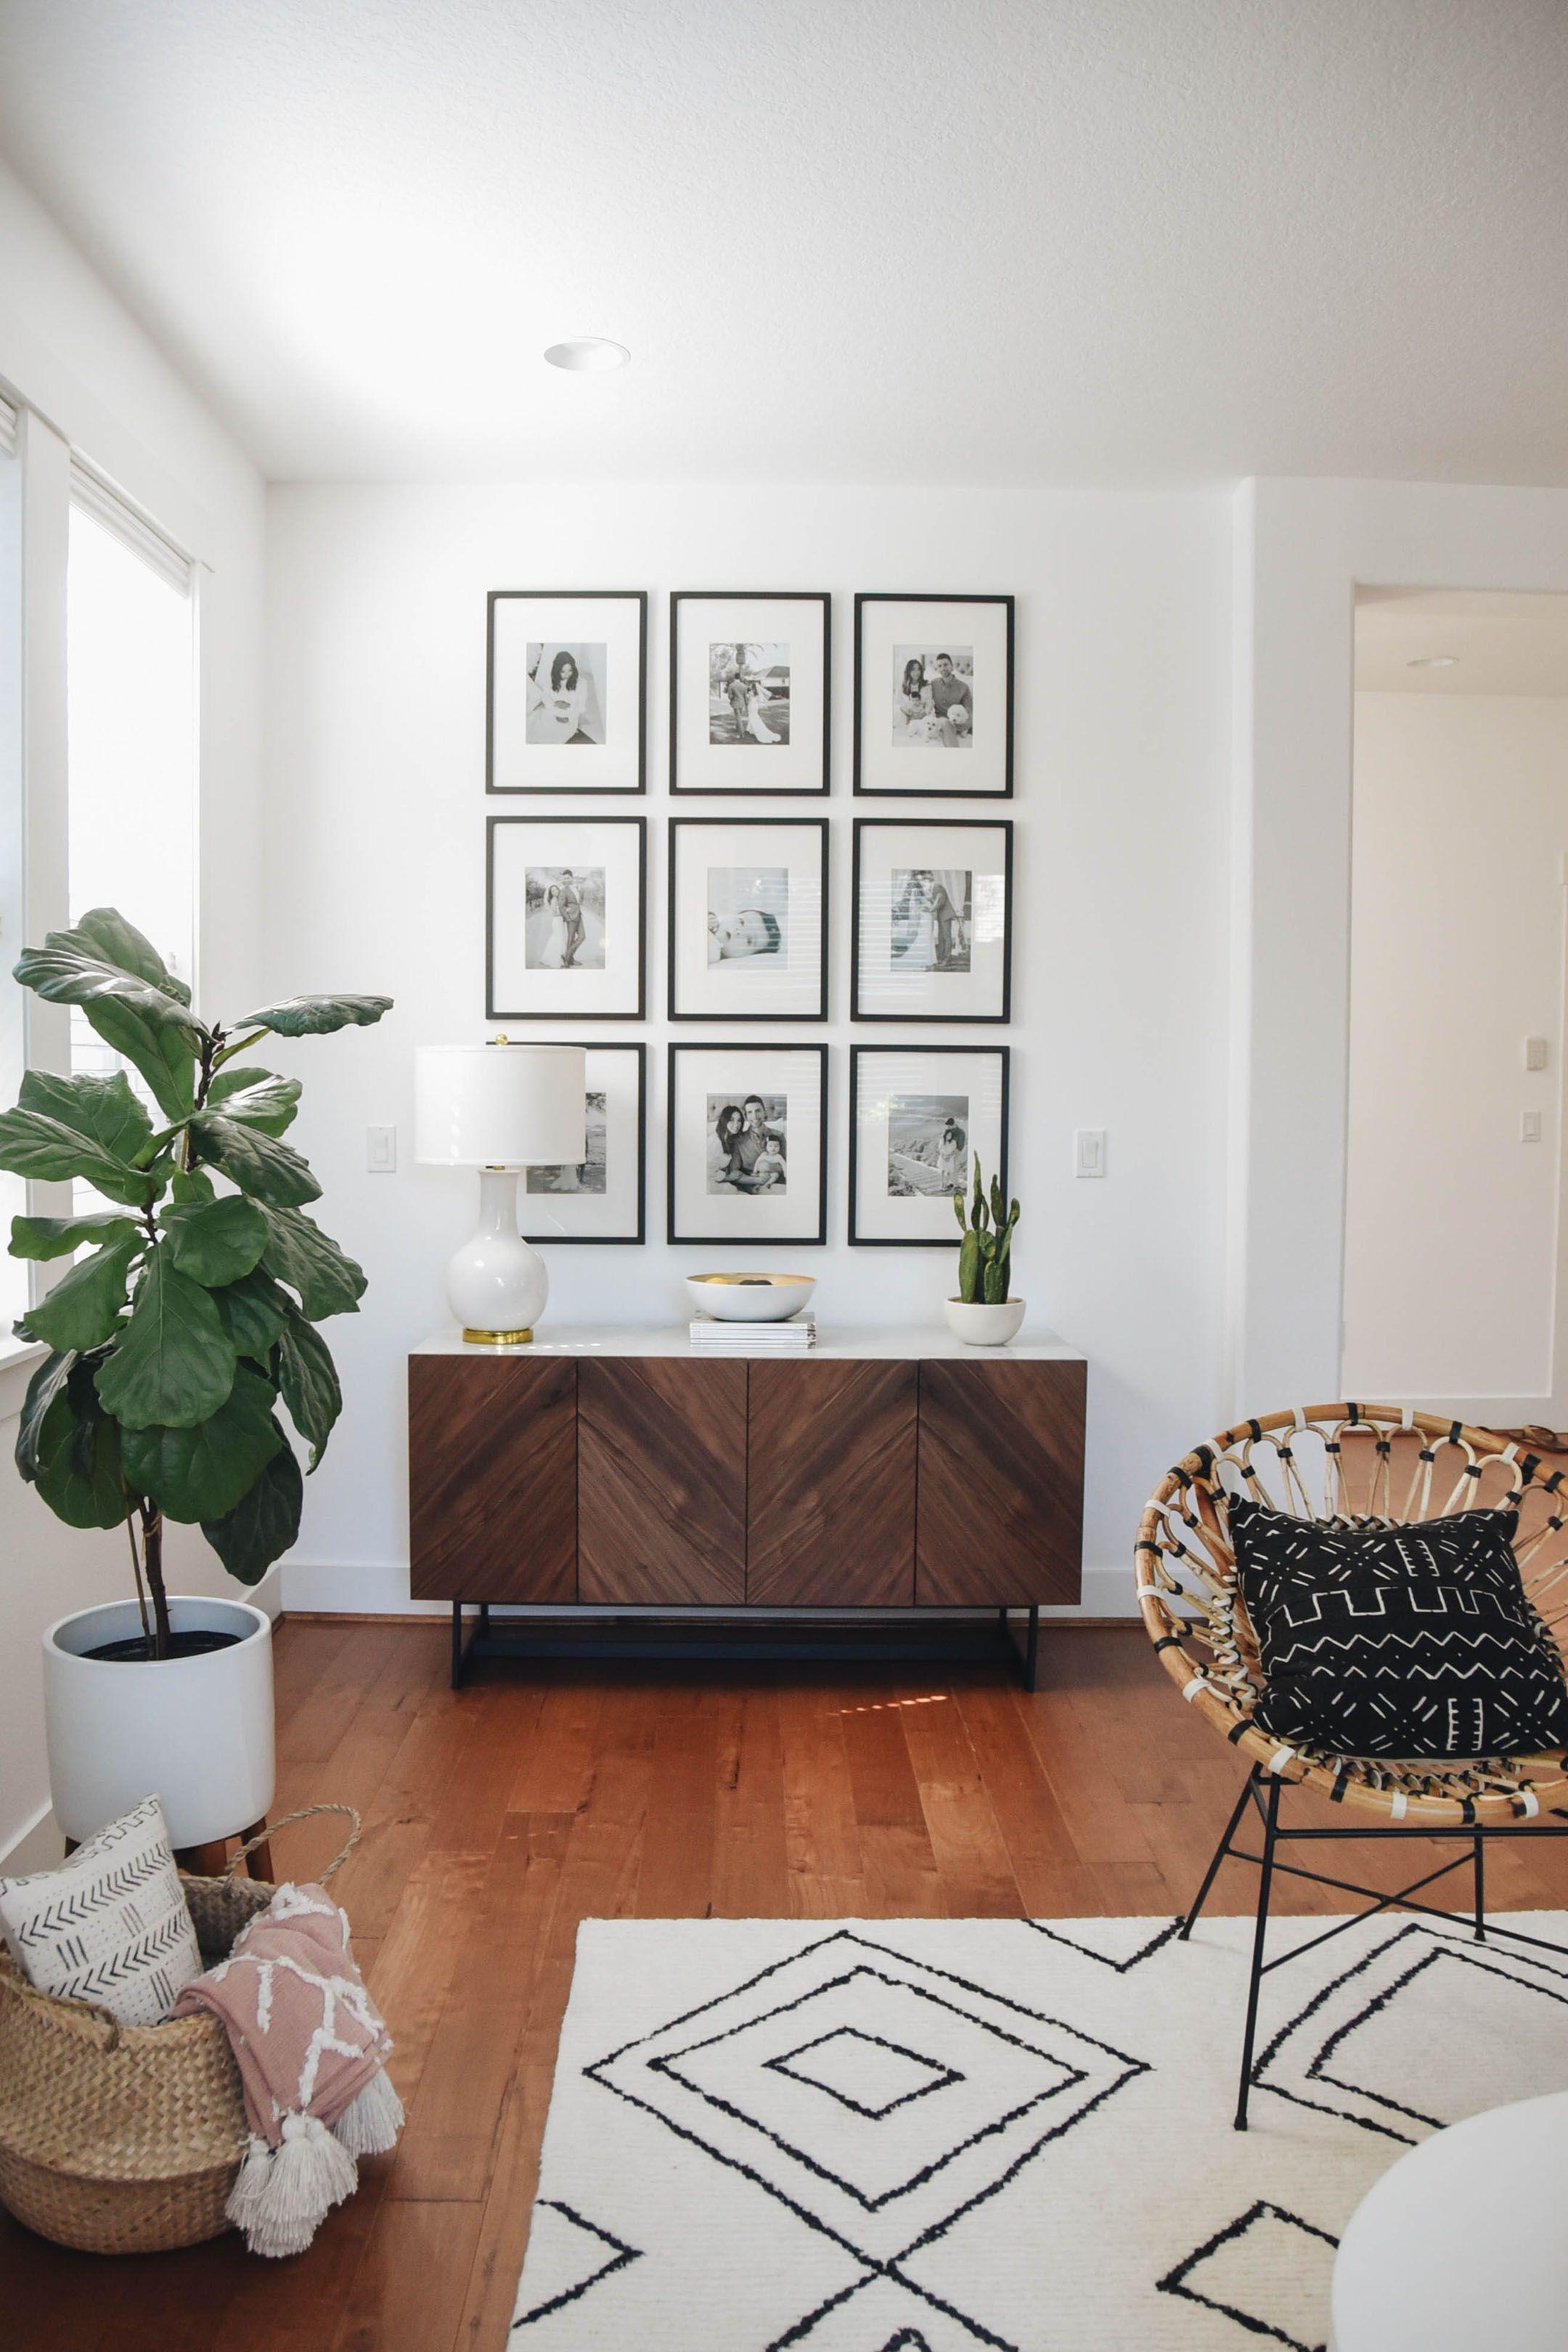 Living Room Reveal With Article Decoracion Hogar Decoracion De